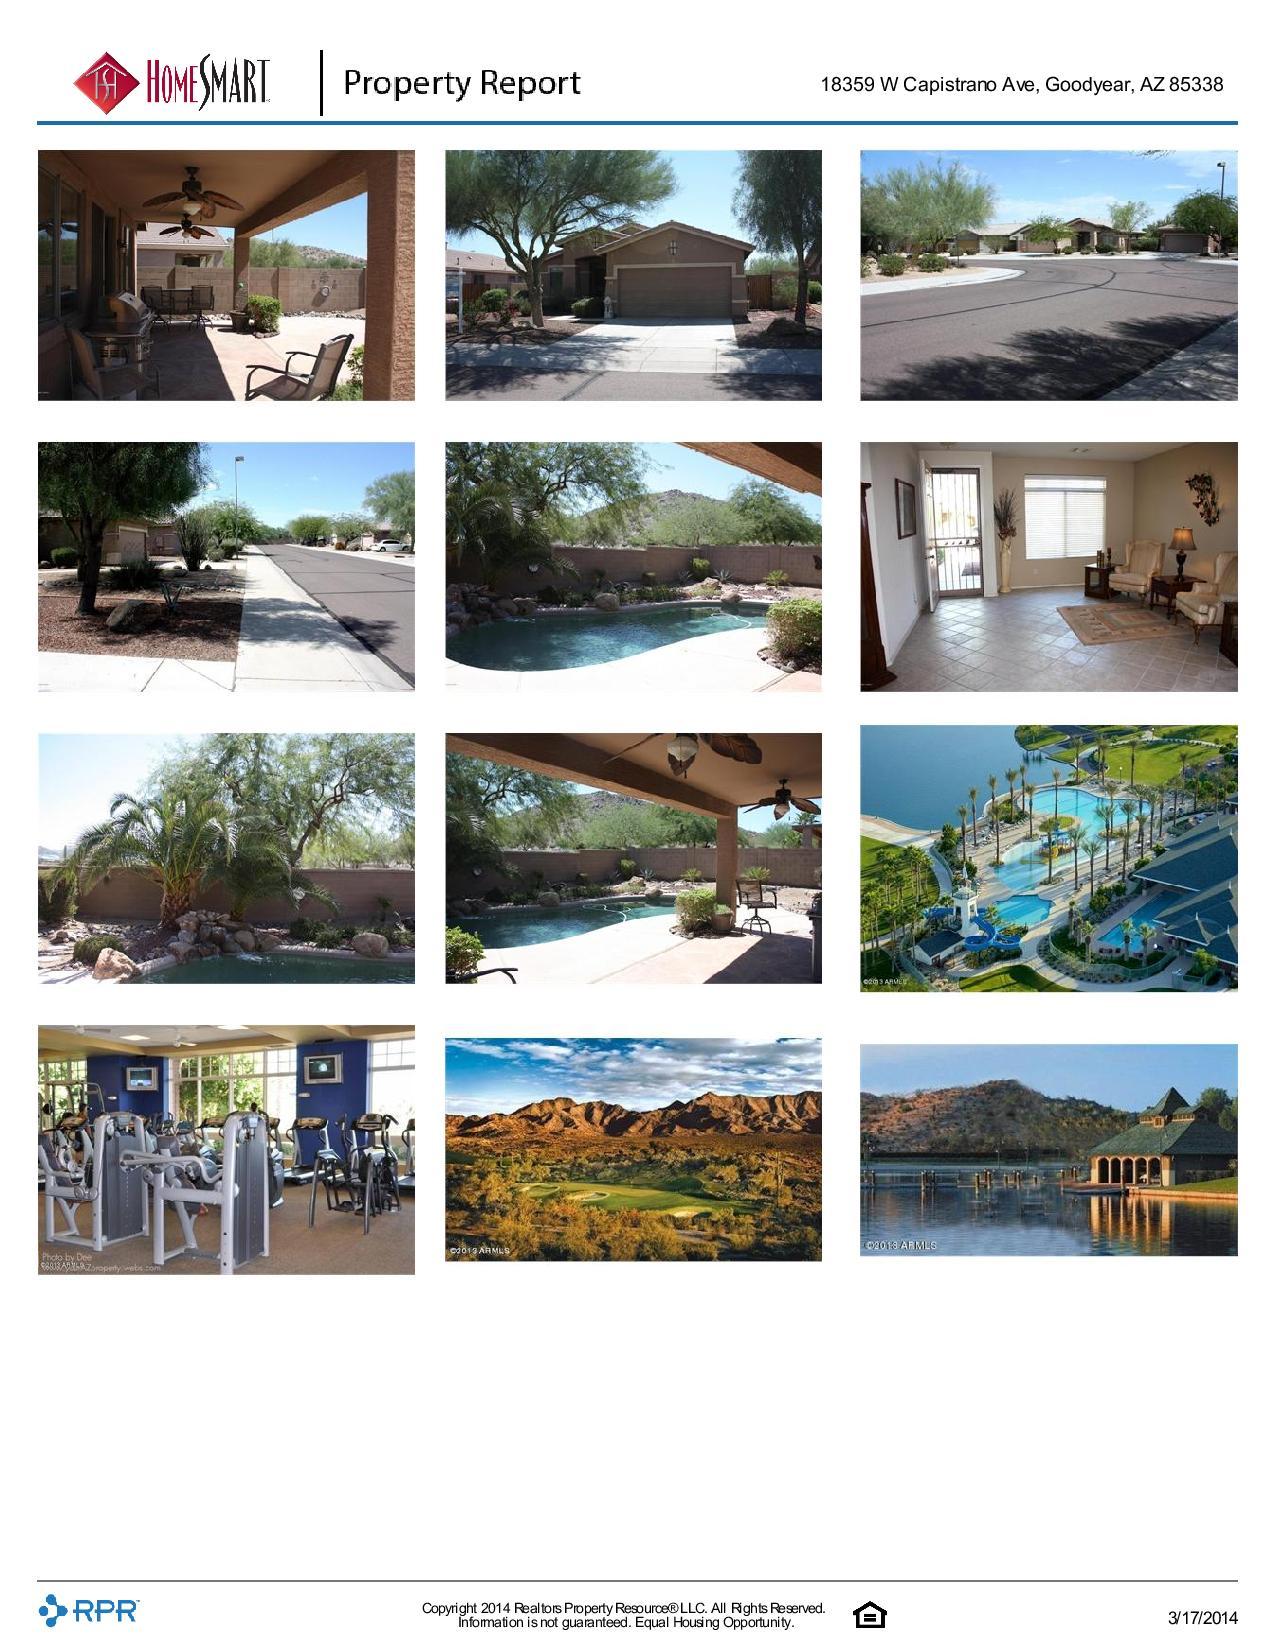 18359-W-Capistrano-Ave-Goodyear-AZ-85338-page-008